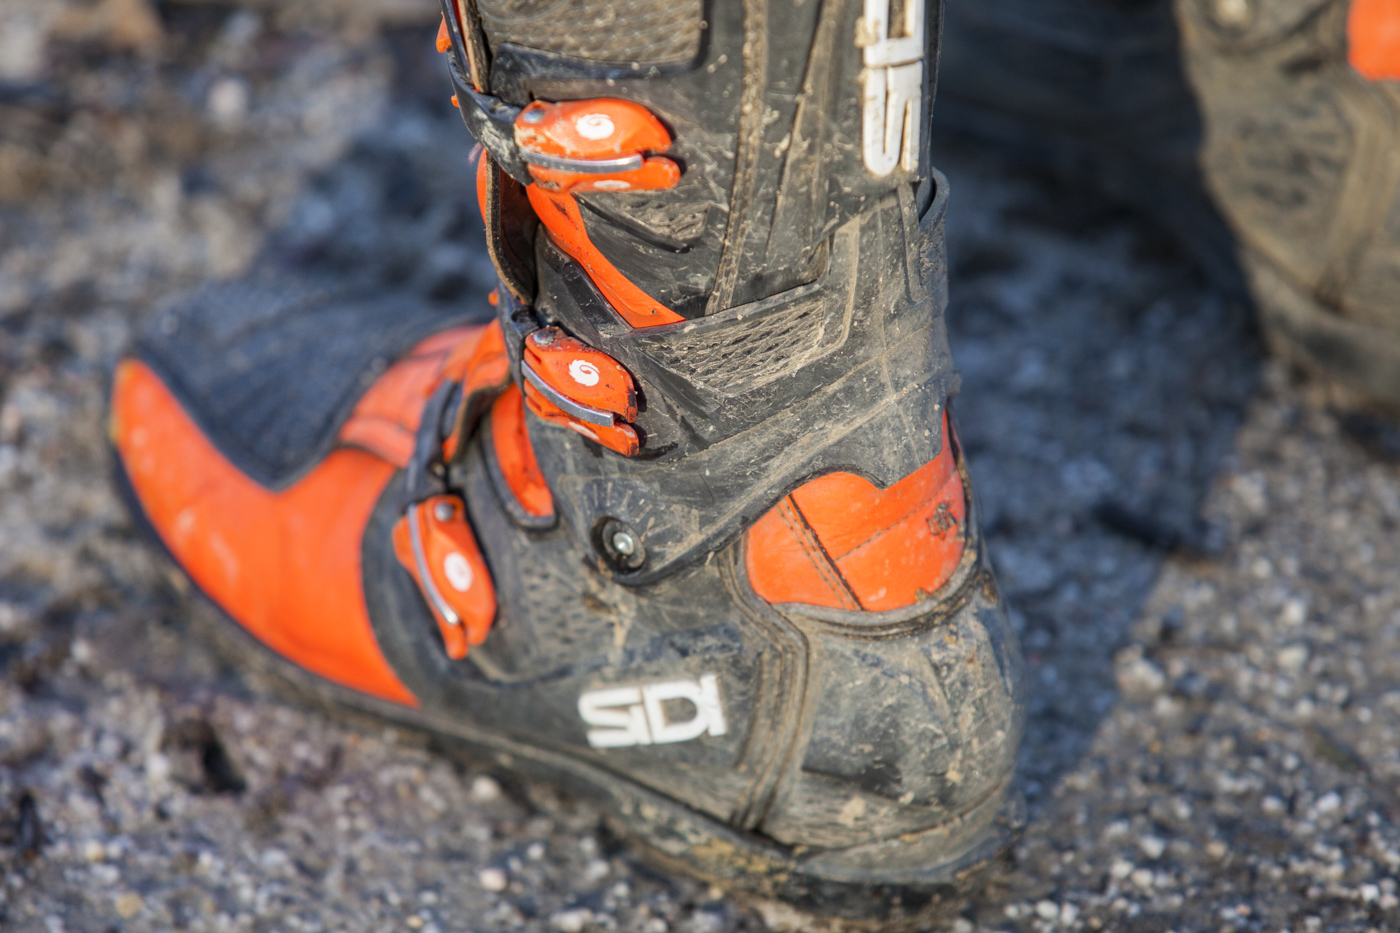 Rated - Sidi X-treme Boots SRS - Brake